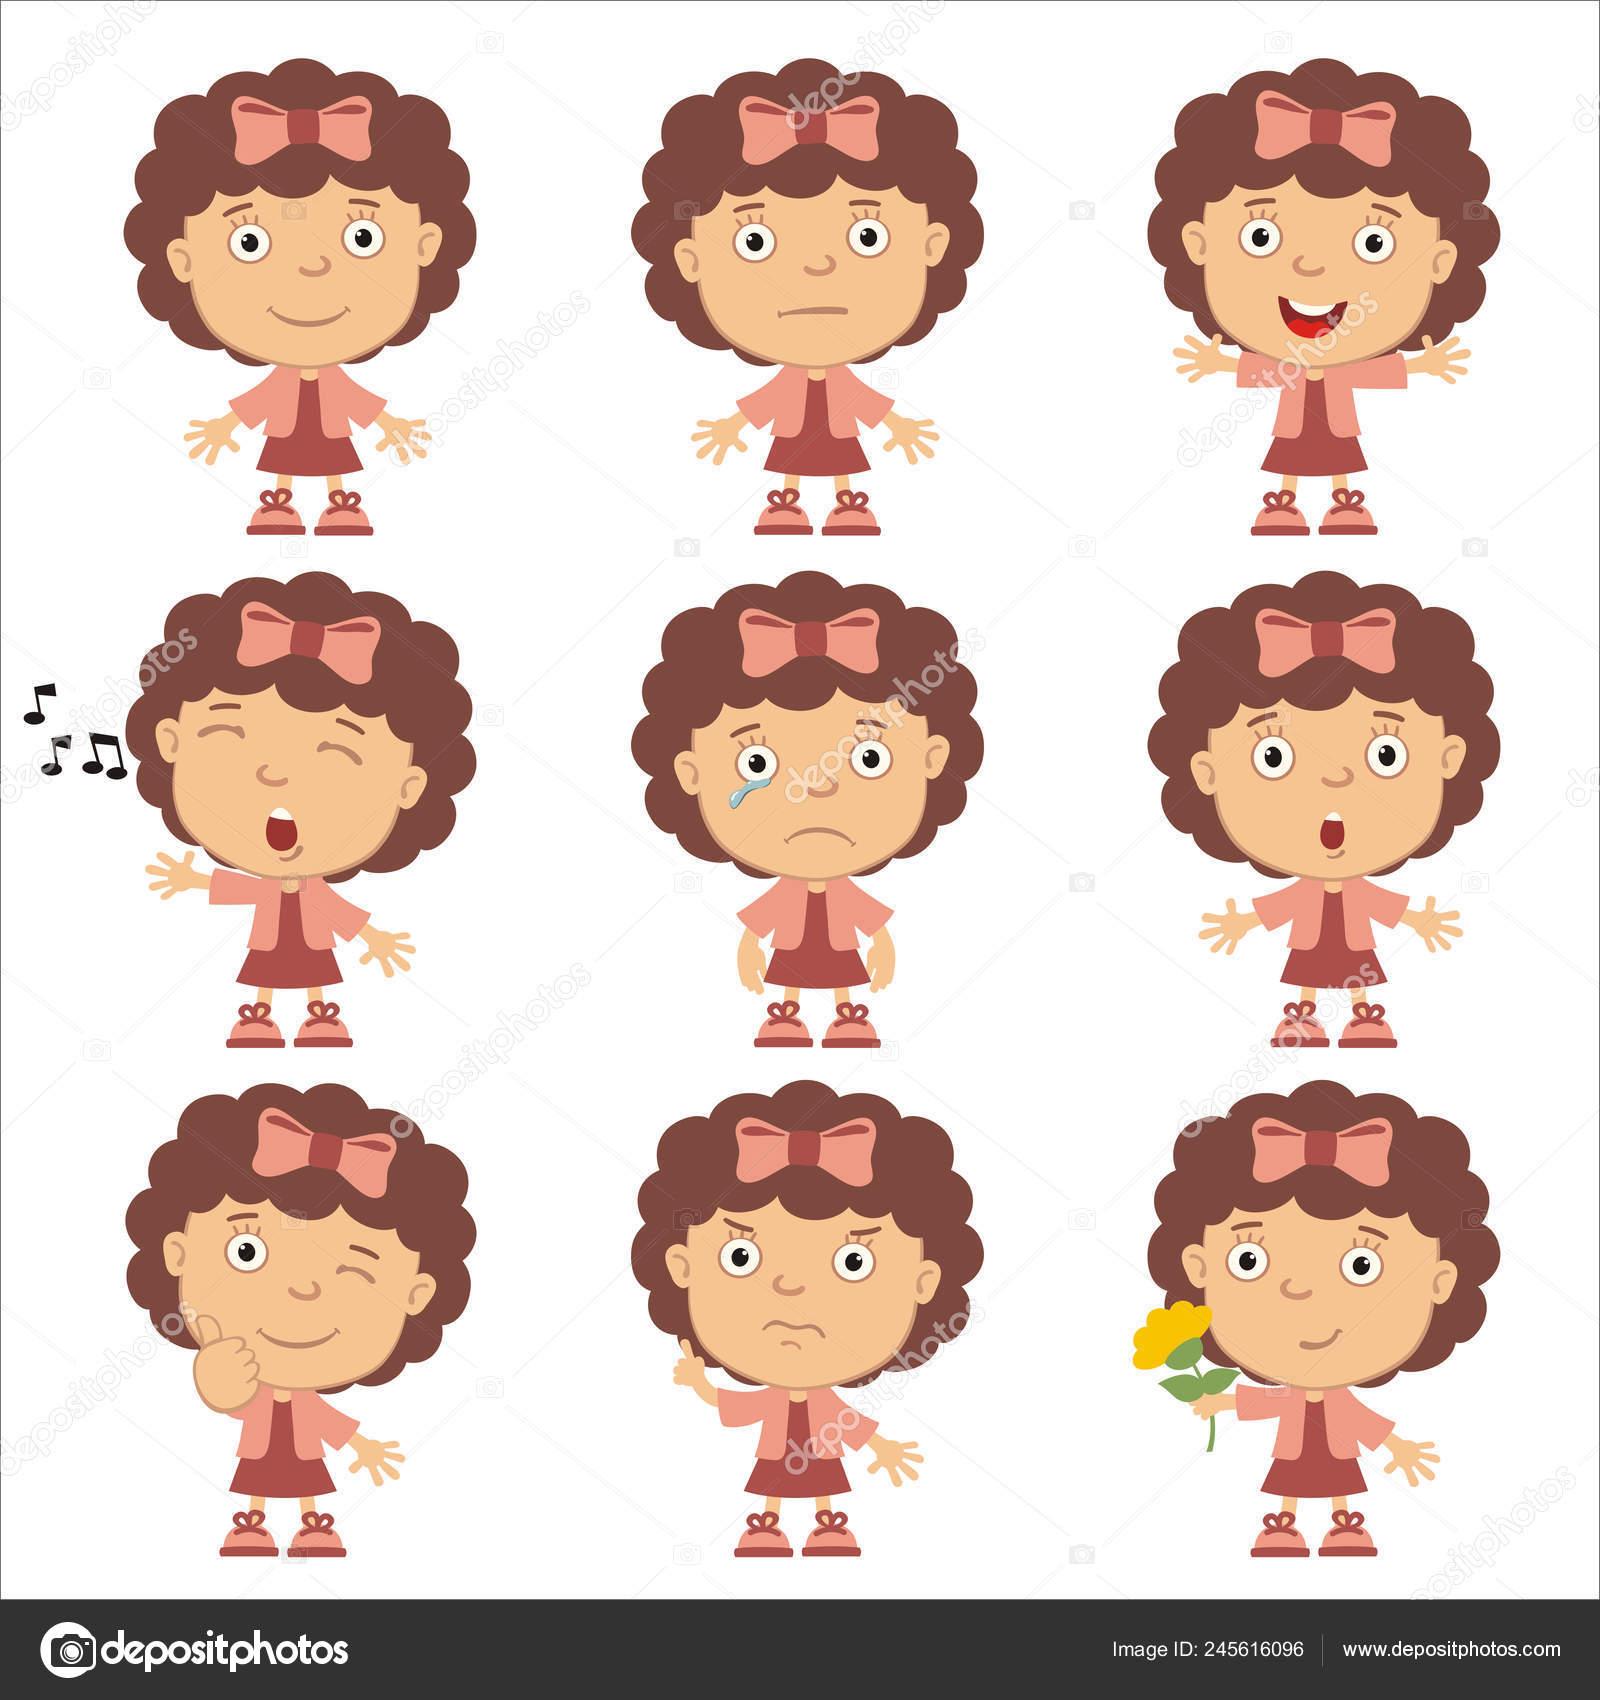 Cartoon Characters With Curly Hair Set Charming Cartoon Characters Girls Curly Hair Pink Bow Different Stock Vector C Dmitriy D 245616096